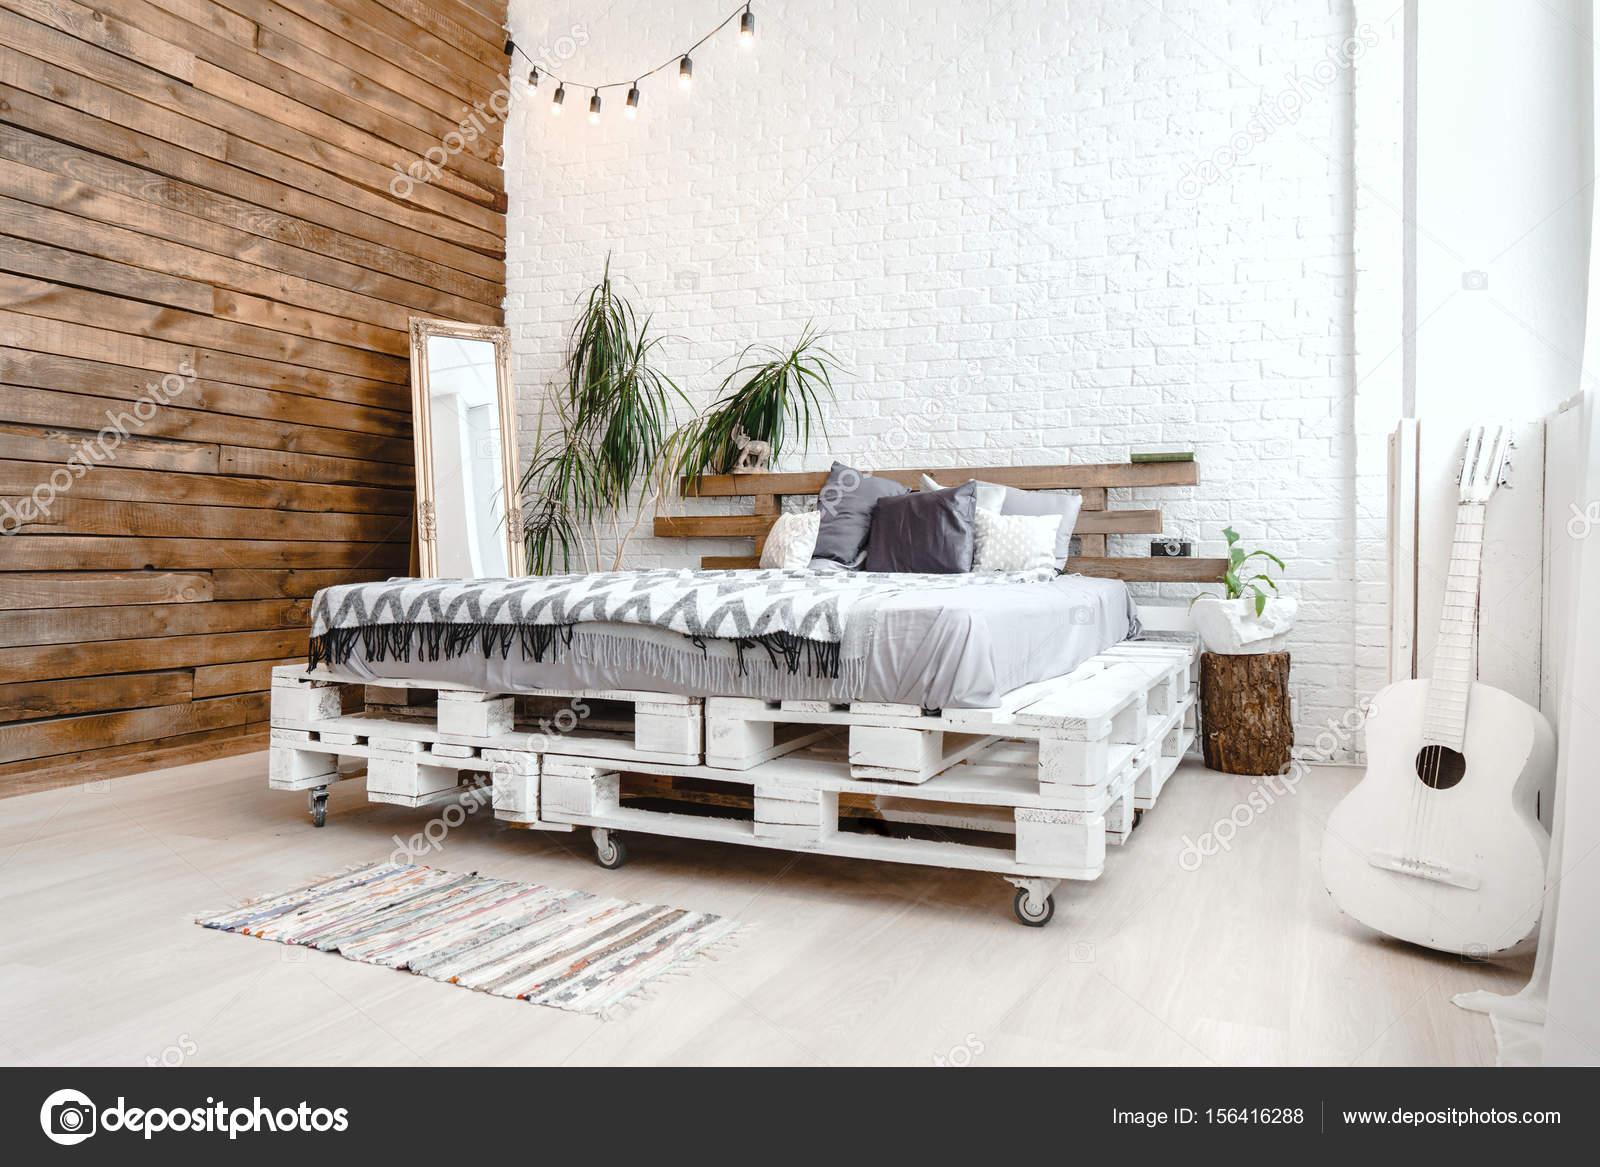 Moderne studio decor ontwerp met pallets bed plant in vaas retro